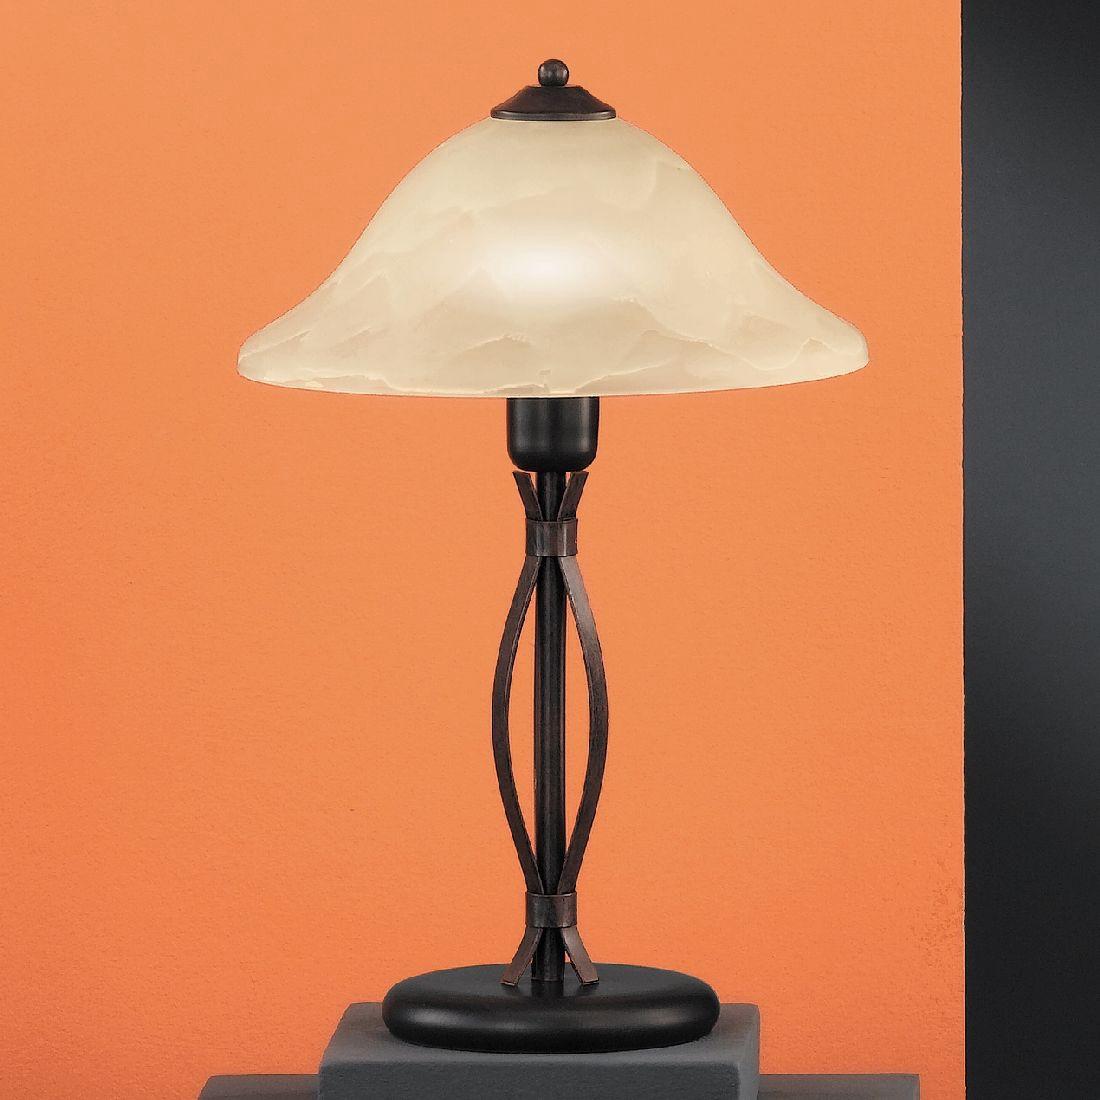 EEK A++, Tischleuchte Colonial - Gerade - Höhe: 46 cm, Honsel